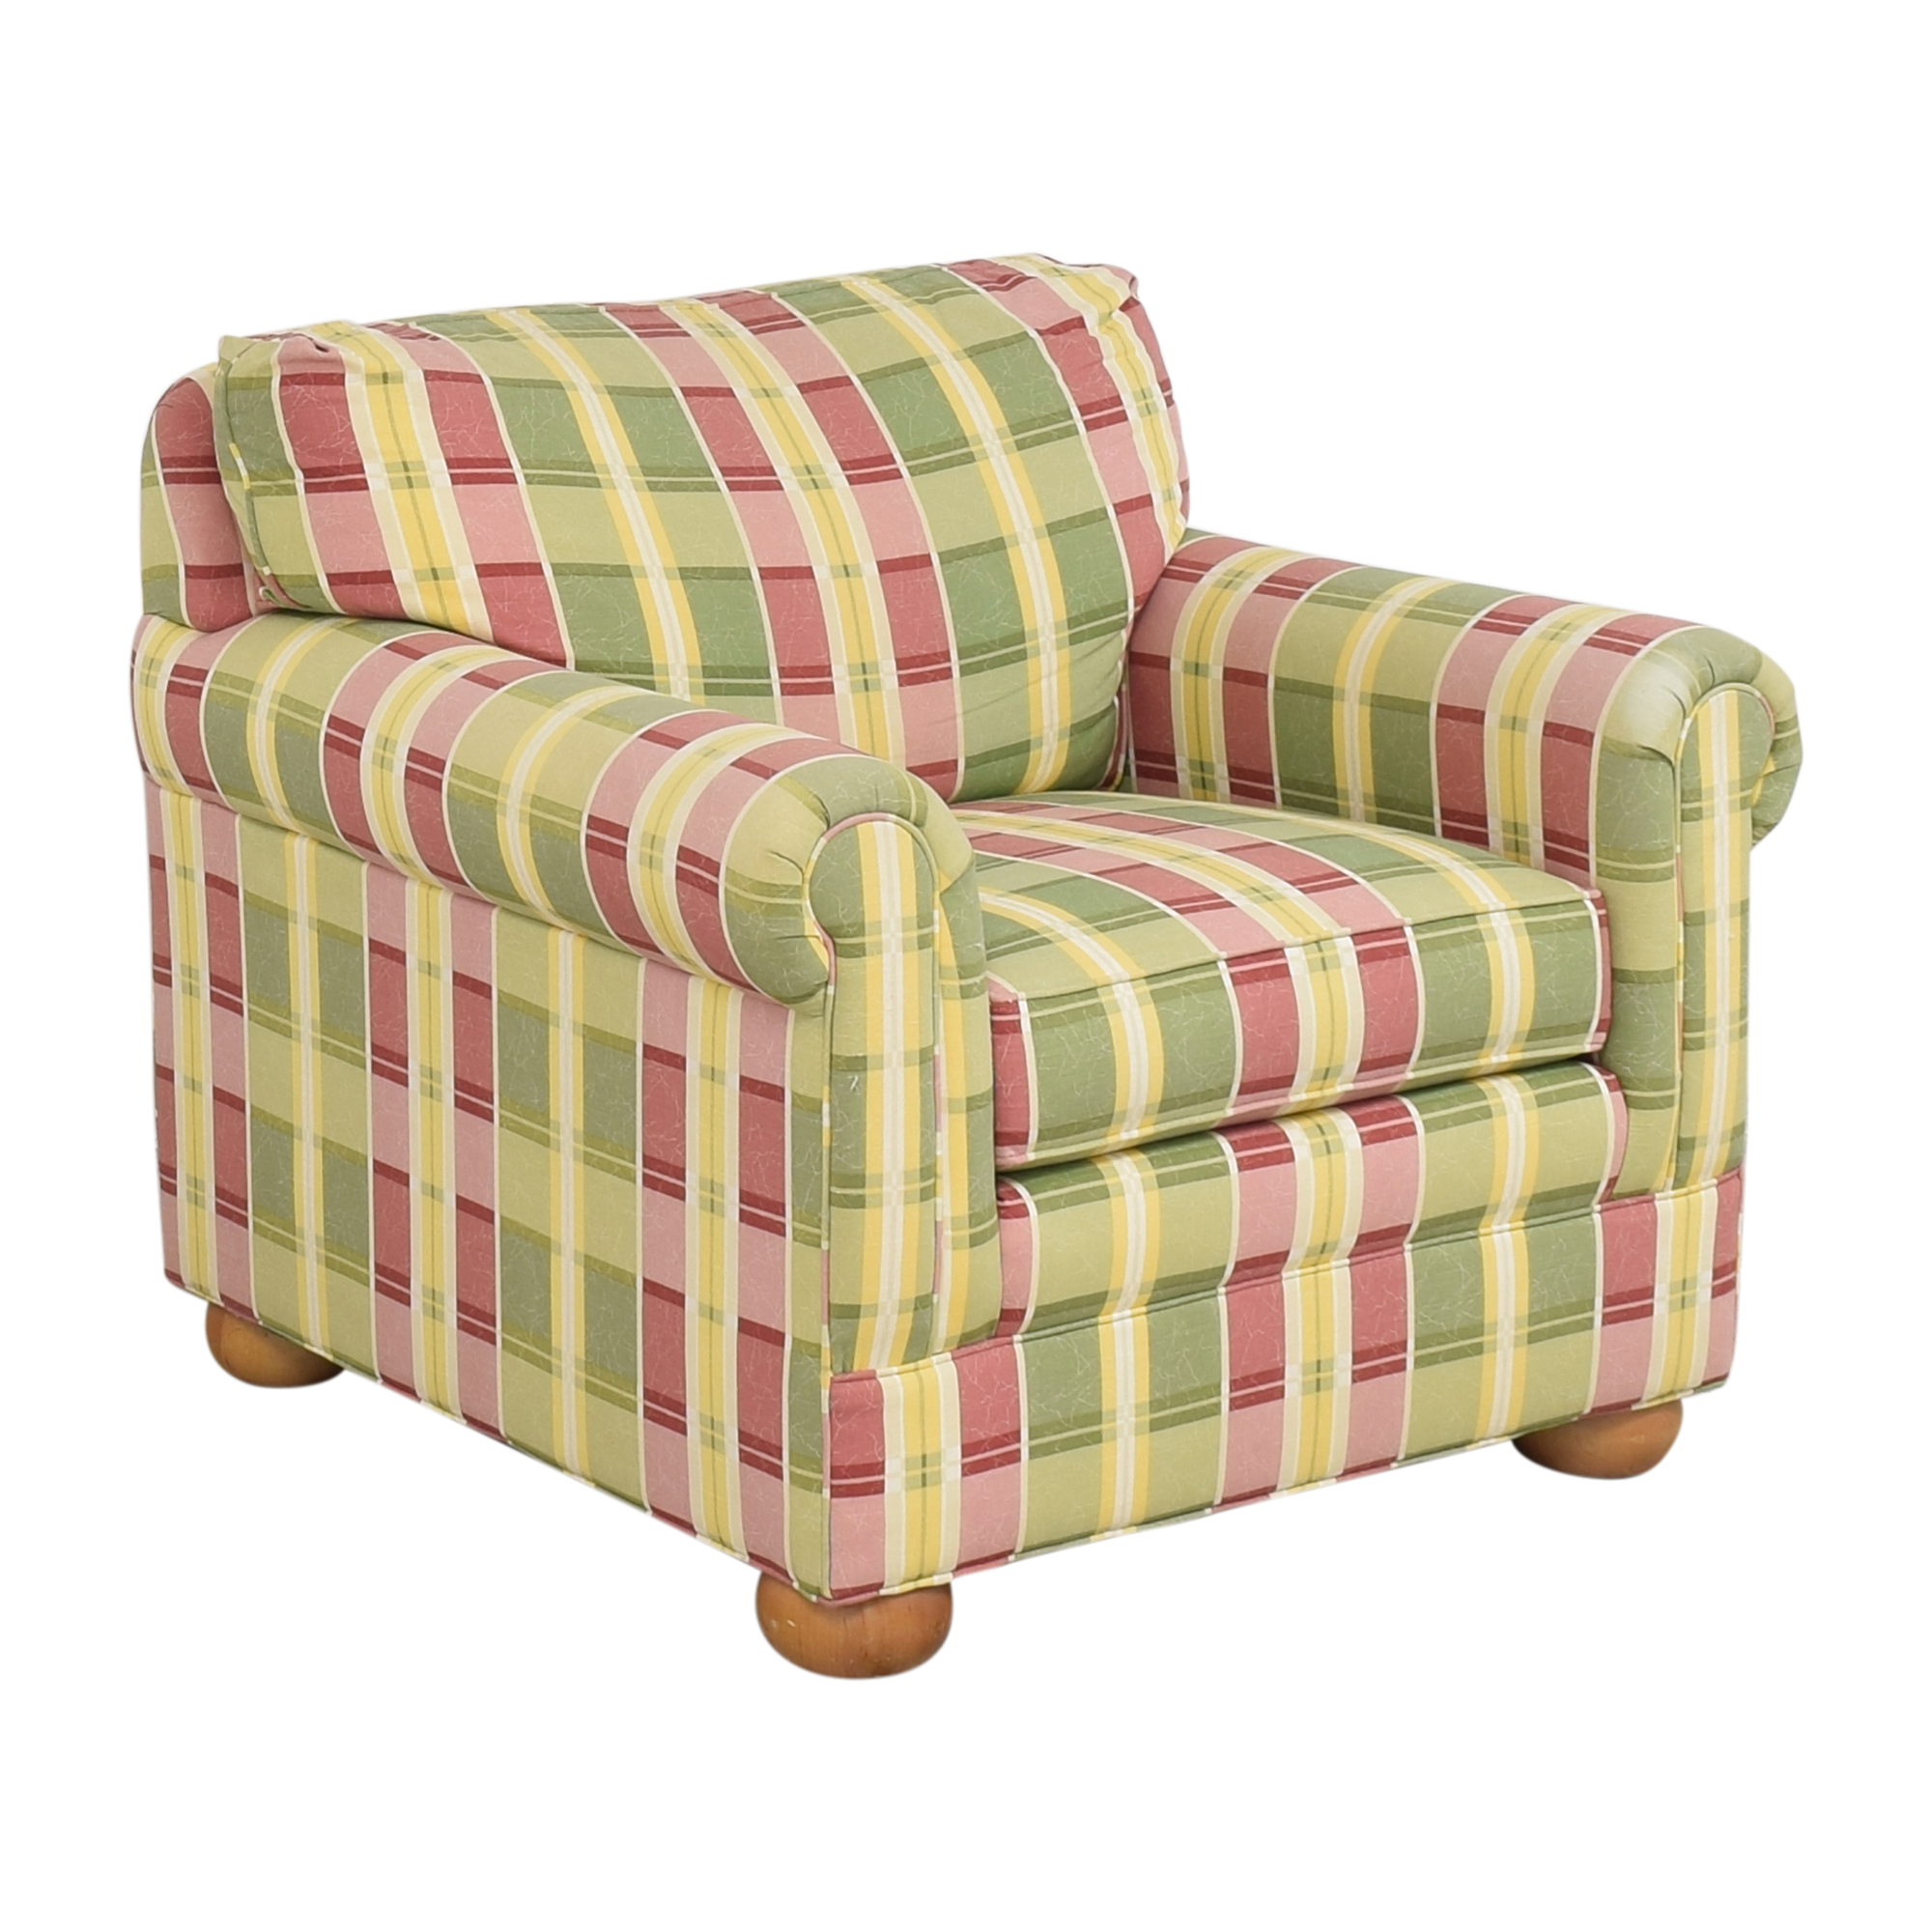 Ethan Allen Ethan Allen Plaid Club Chair used